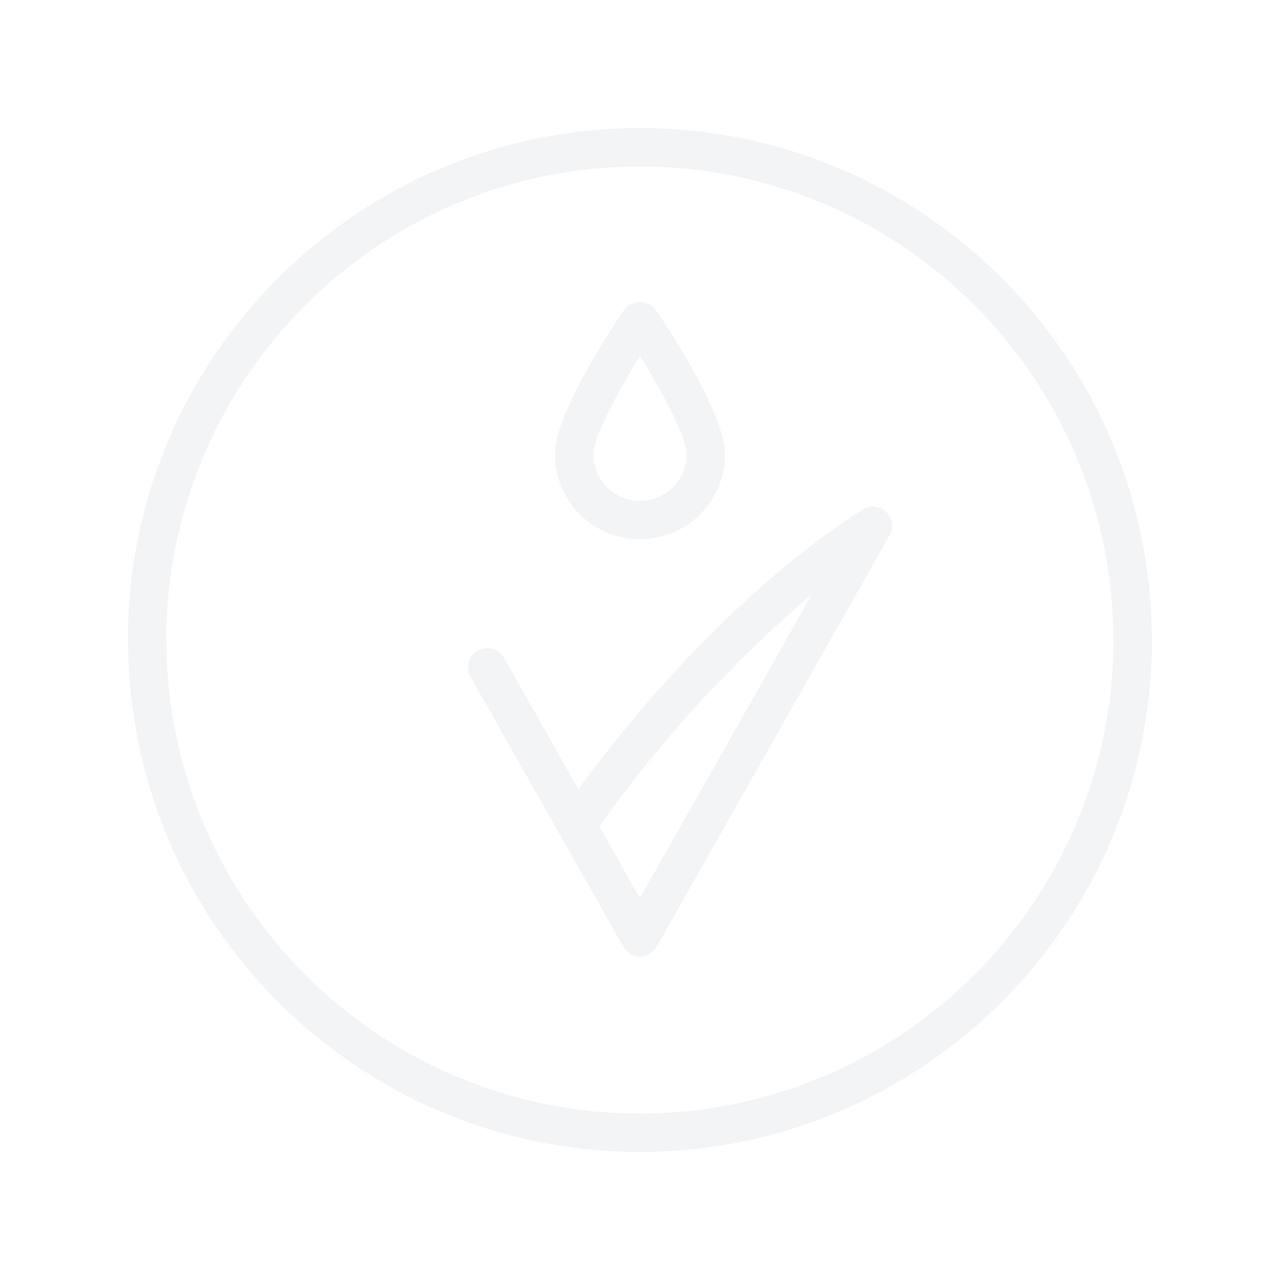 THEBALM Smoke Balm Vol 4 Eyeshadow Palette 7.2g